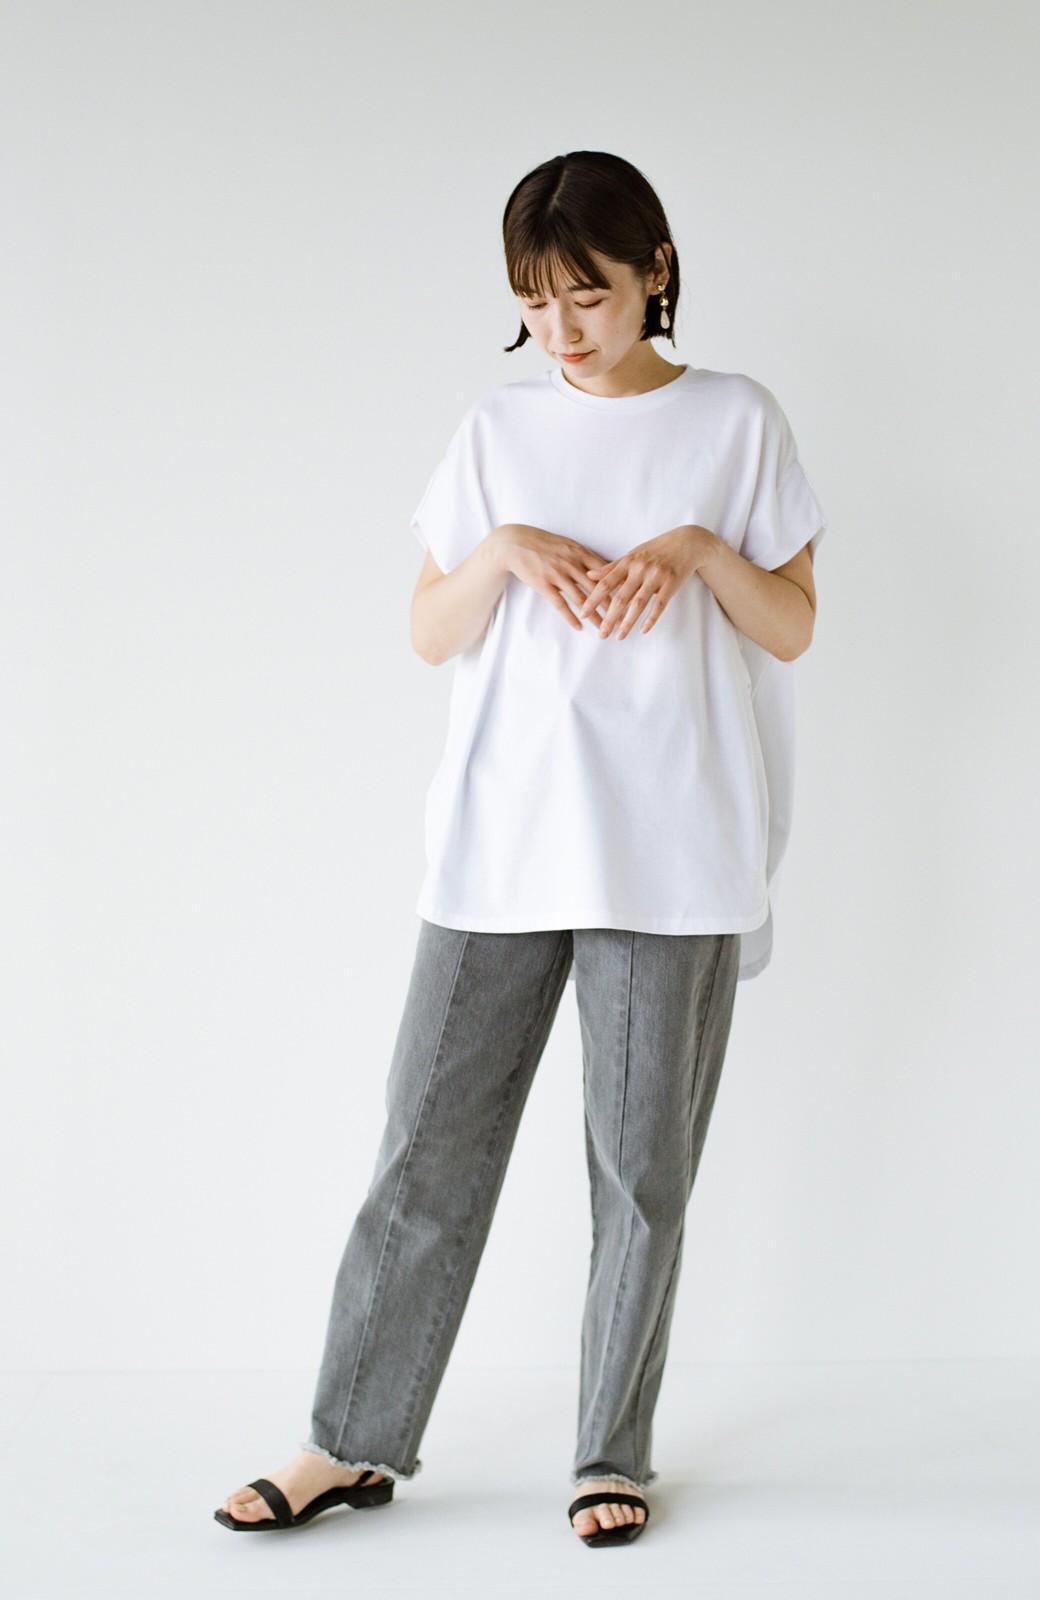 haco! PBPオーガニックコットン 楽ちんなのにブラウス気分で着られる大人のおめかしTシャツ <ホワイト>の商品写真7